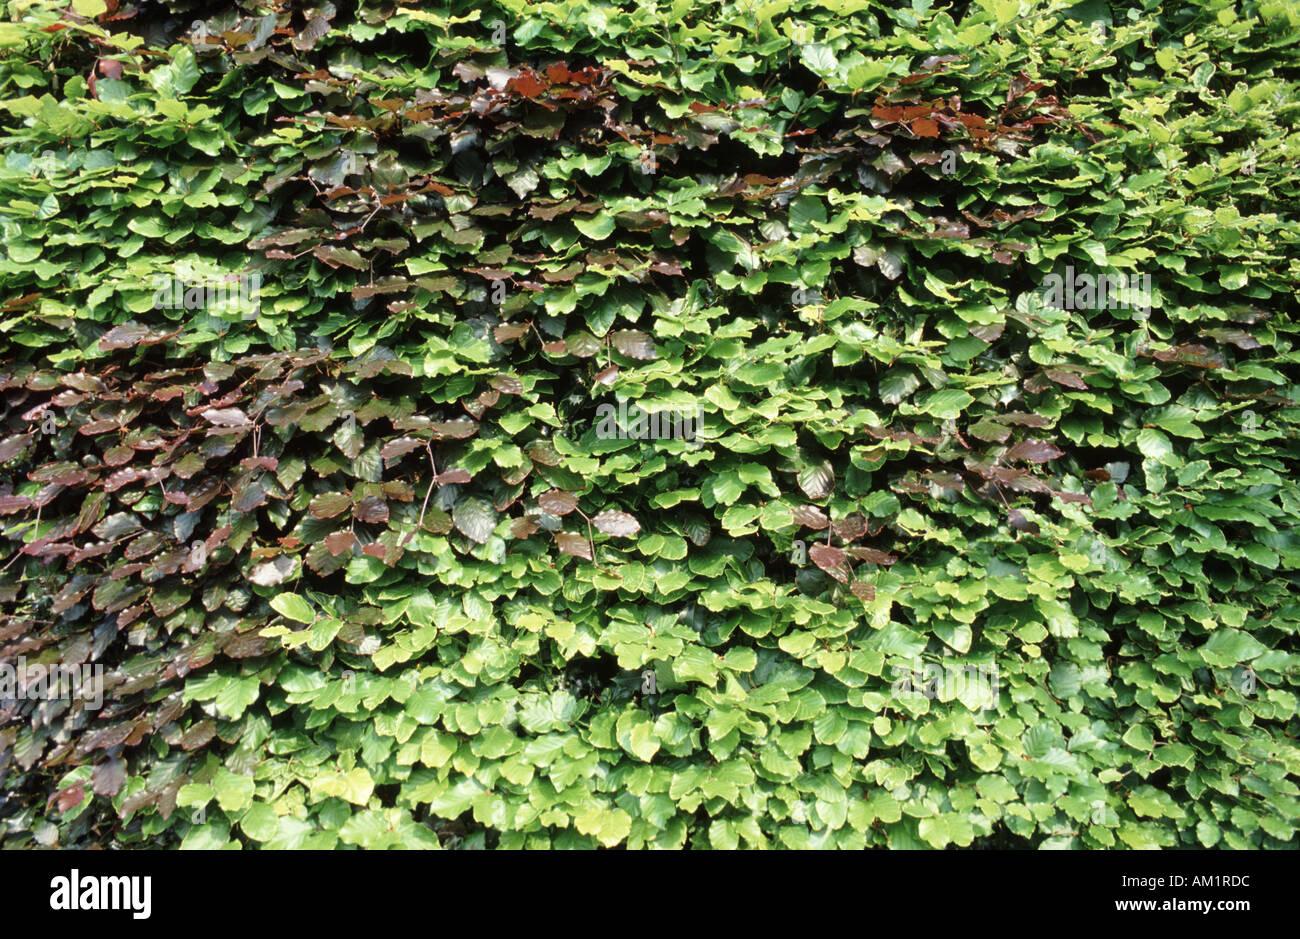 green copper stockfotos green copper bilder alamy. Black Bedroom Furniture Sets. Home Design Ideas